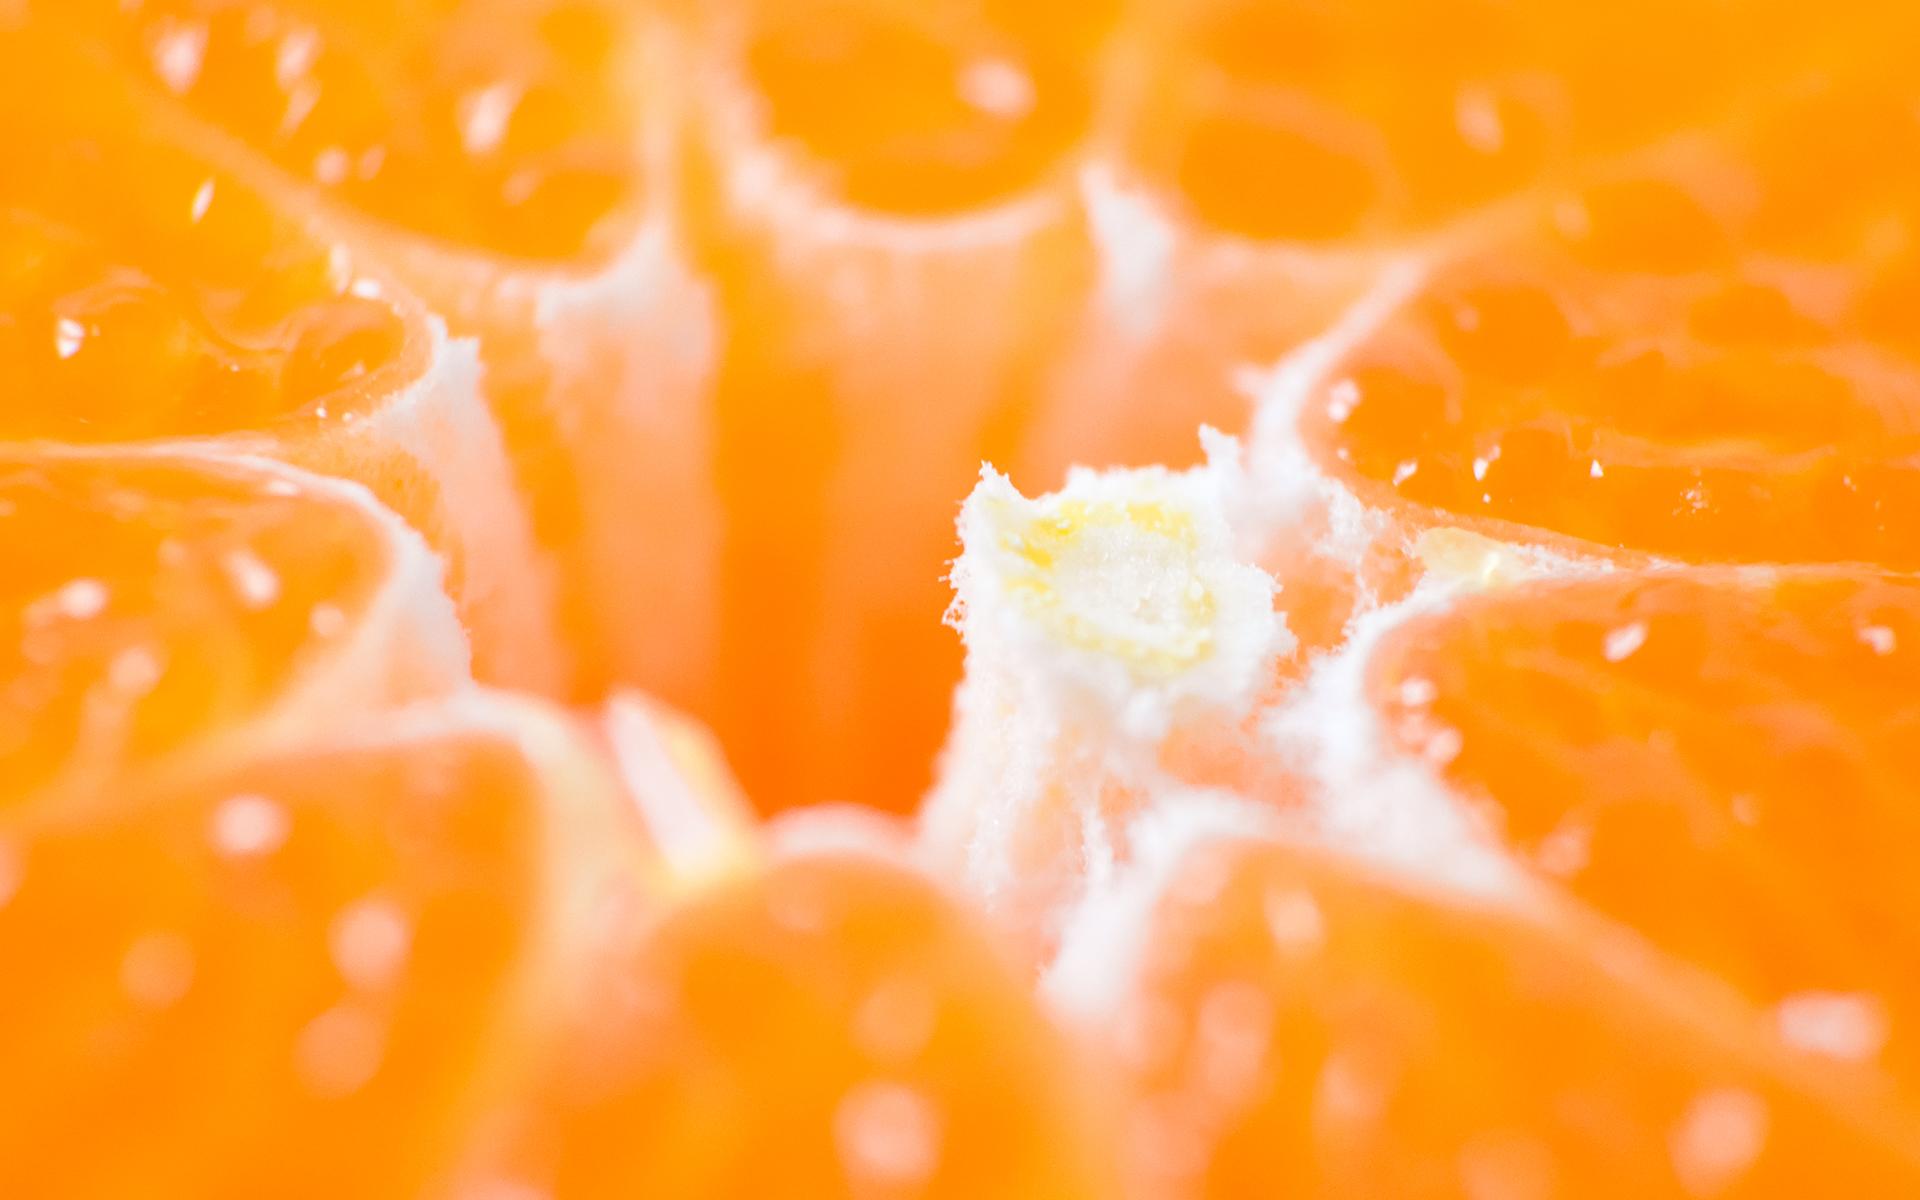 Orange Bubbles wallpaper